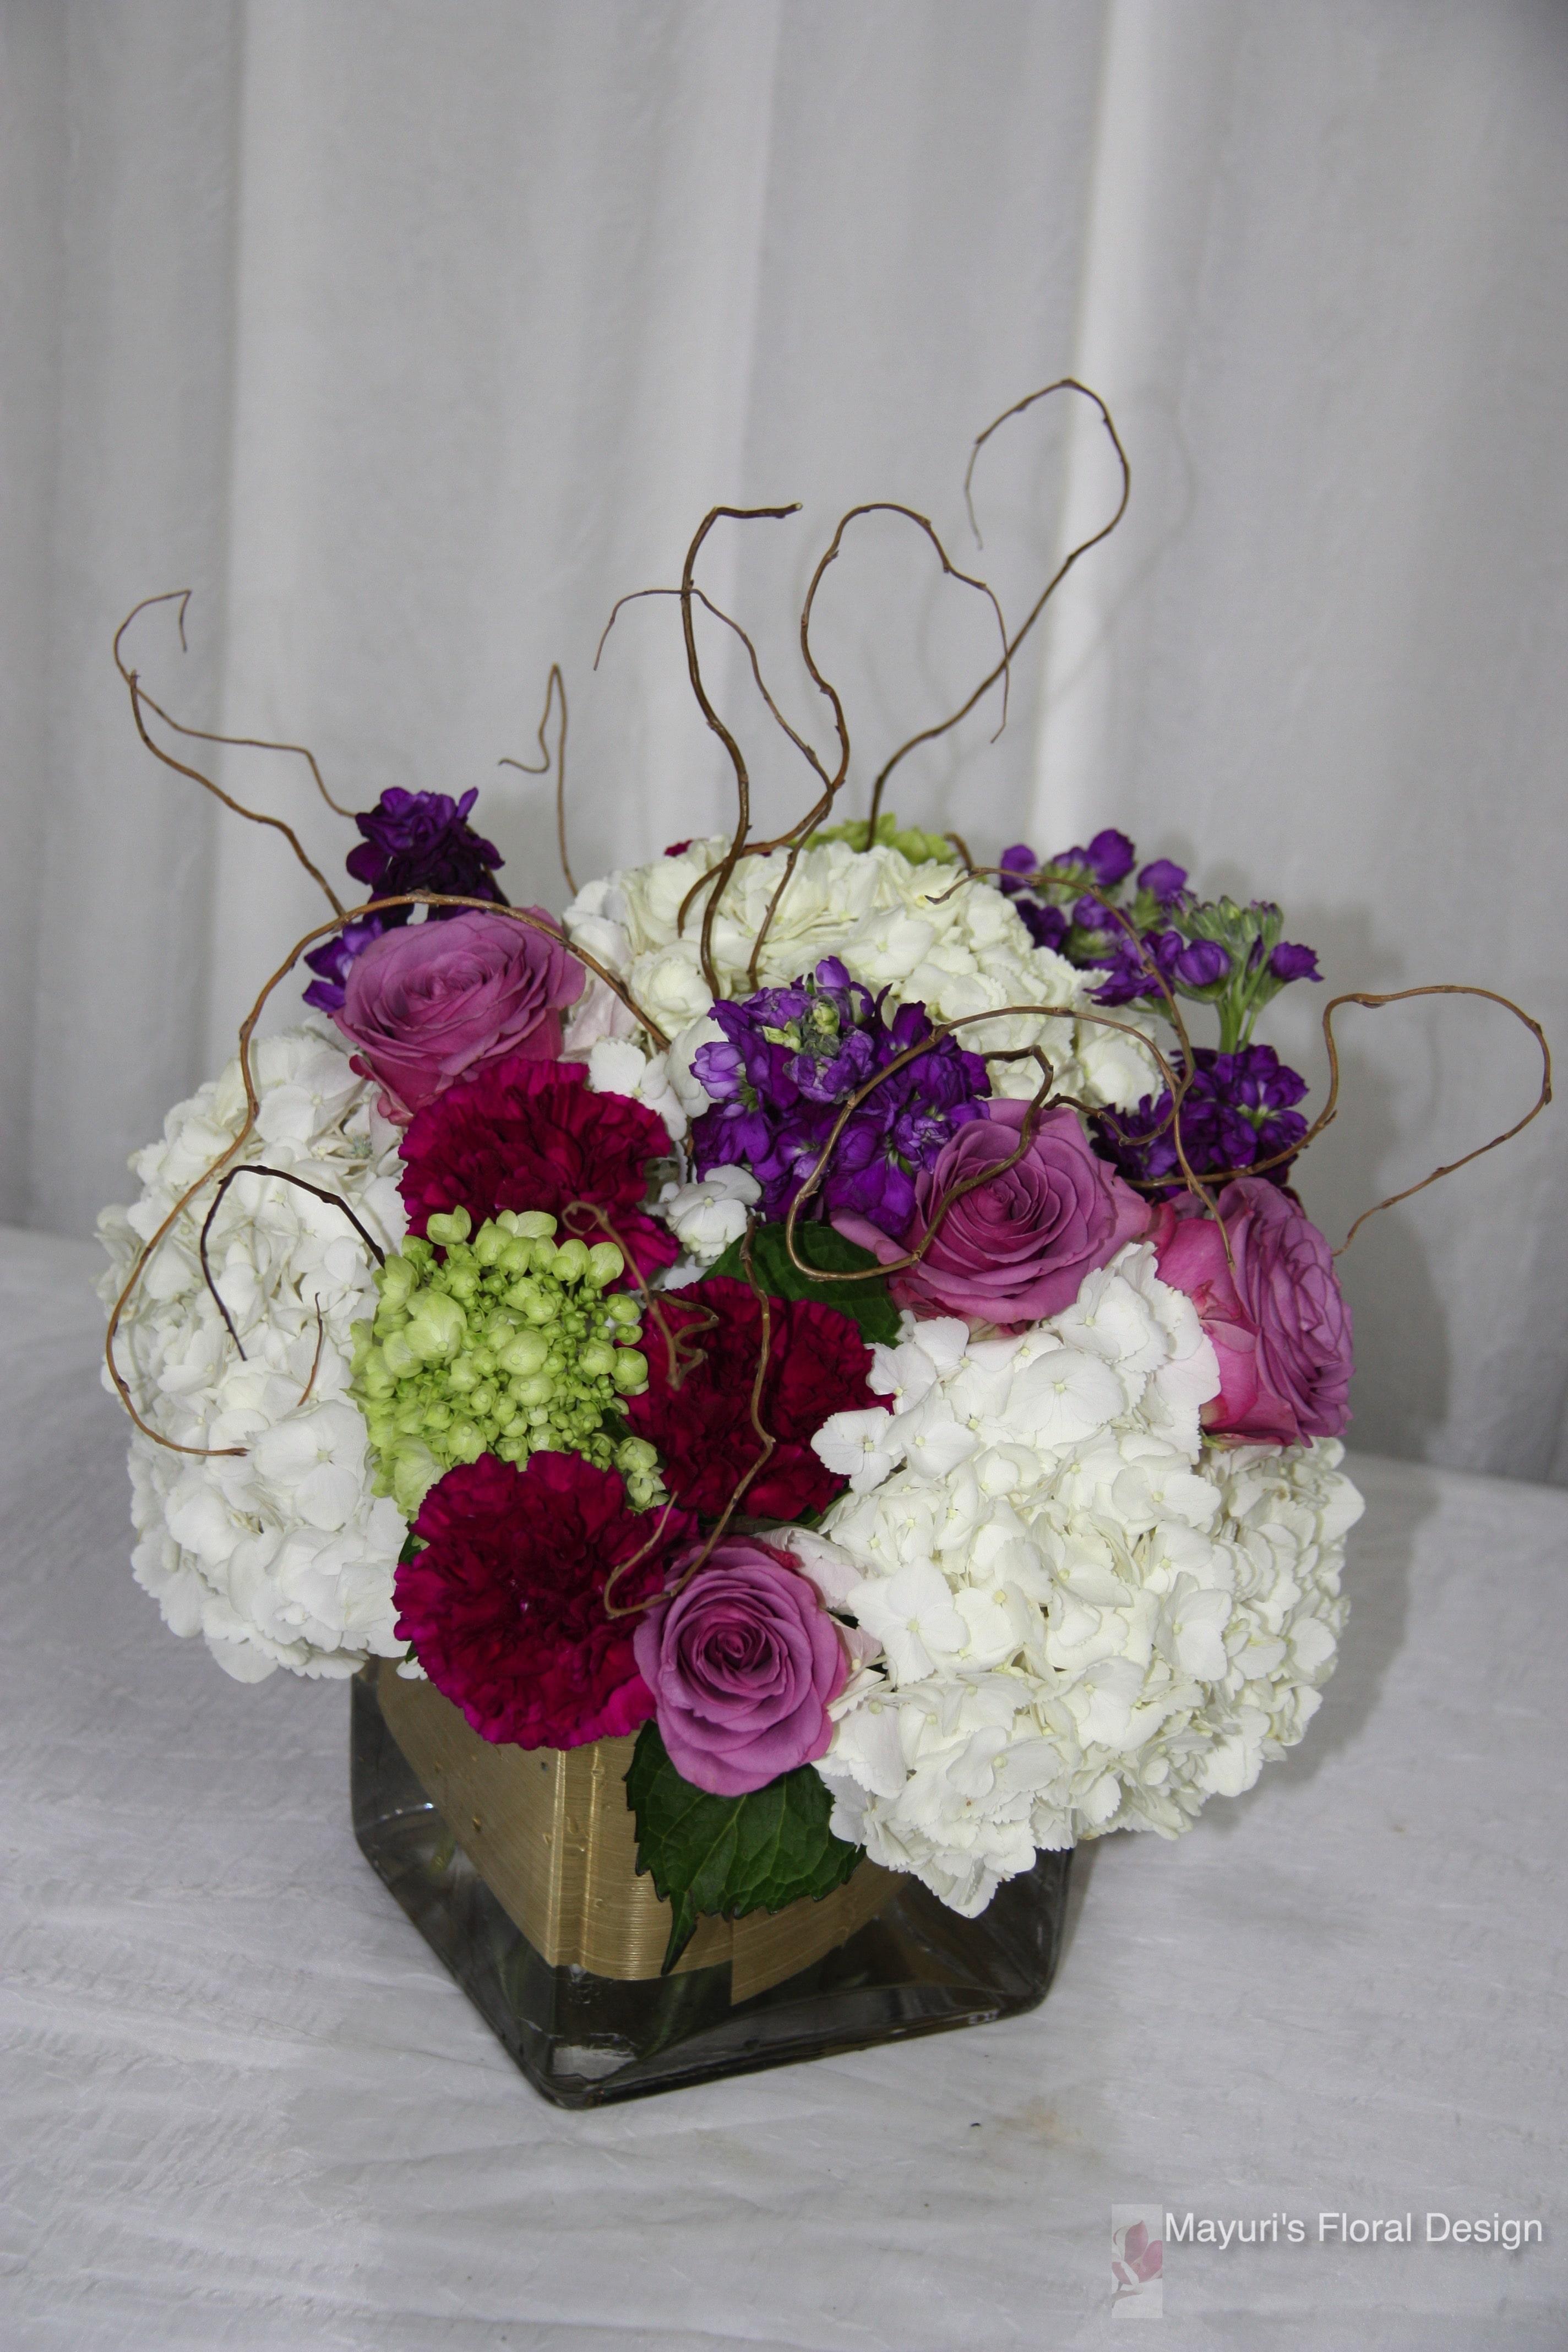 Mayuri S Floral Design 17 Events By Mayuri